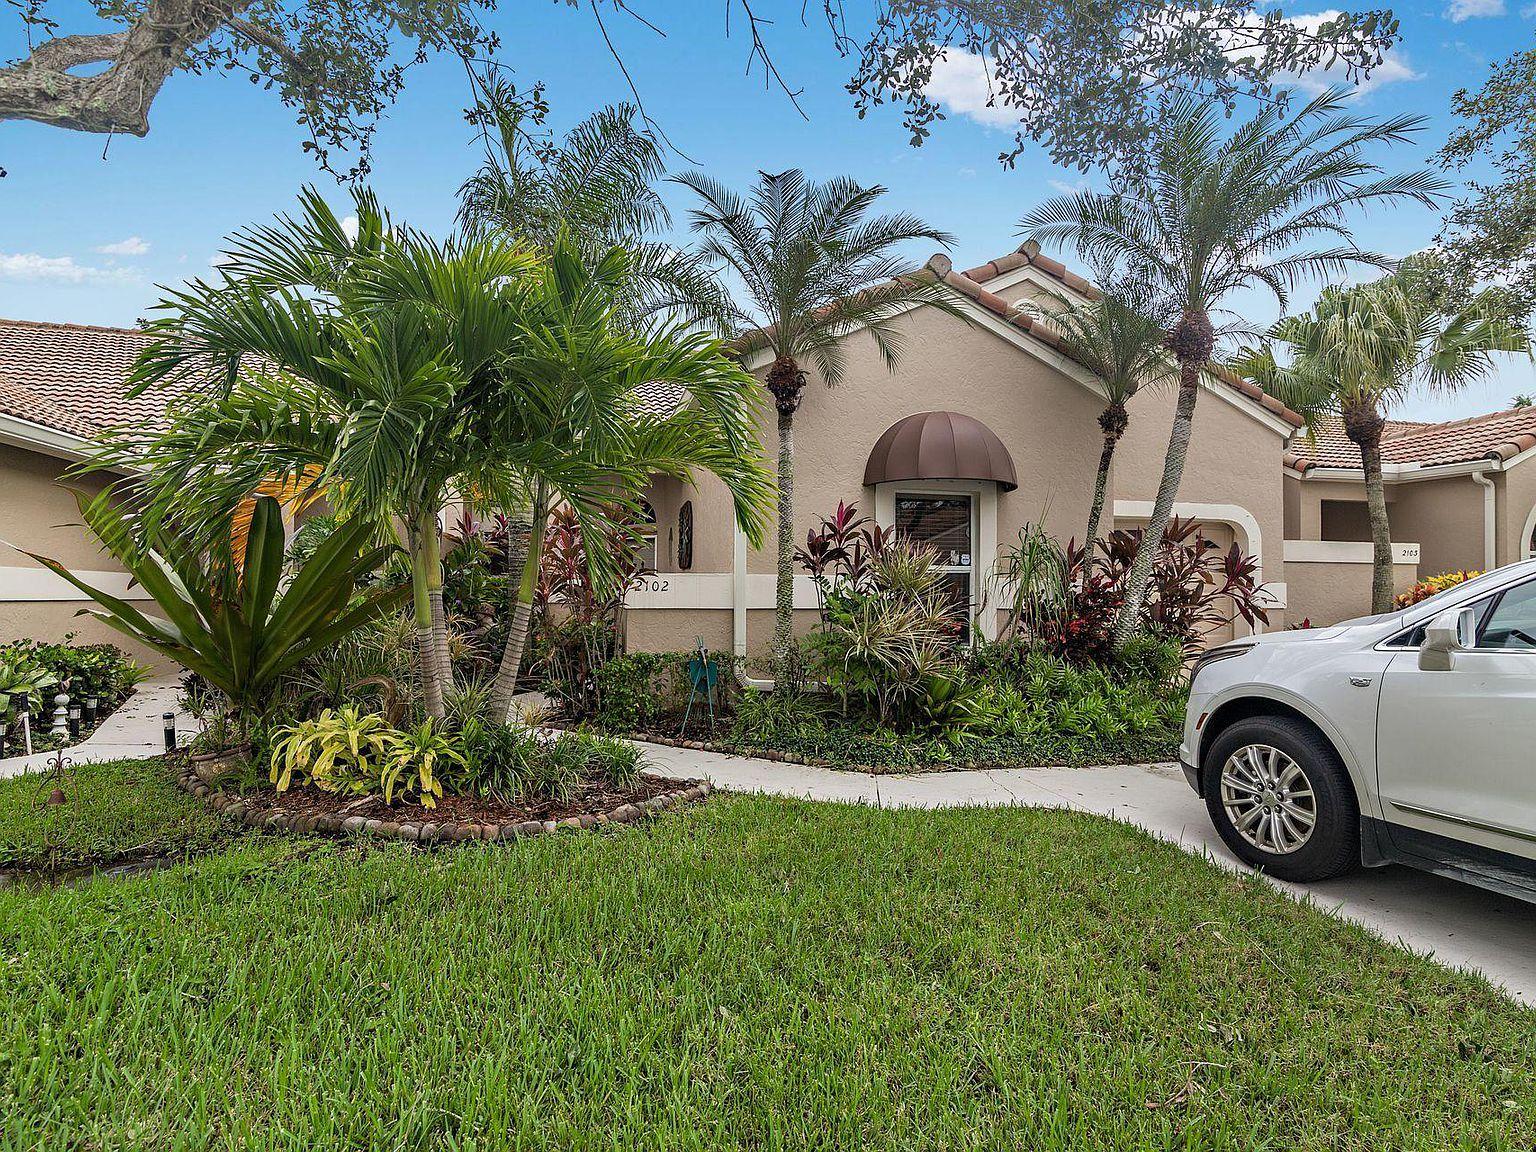 5bd6a62ba858a25d833693baff84e012 cc ft 1536 - Sandalwood Estates Palm Beach Gardens For Rent